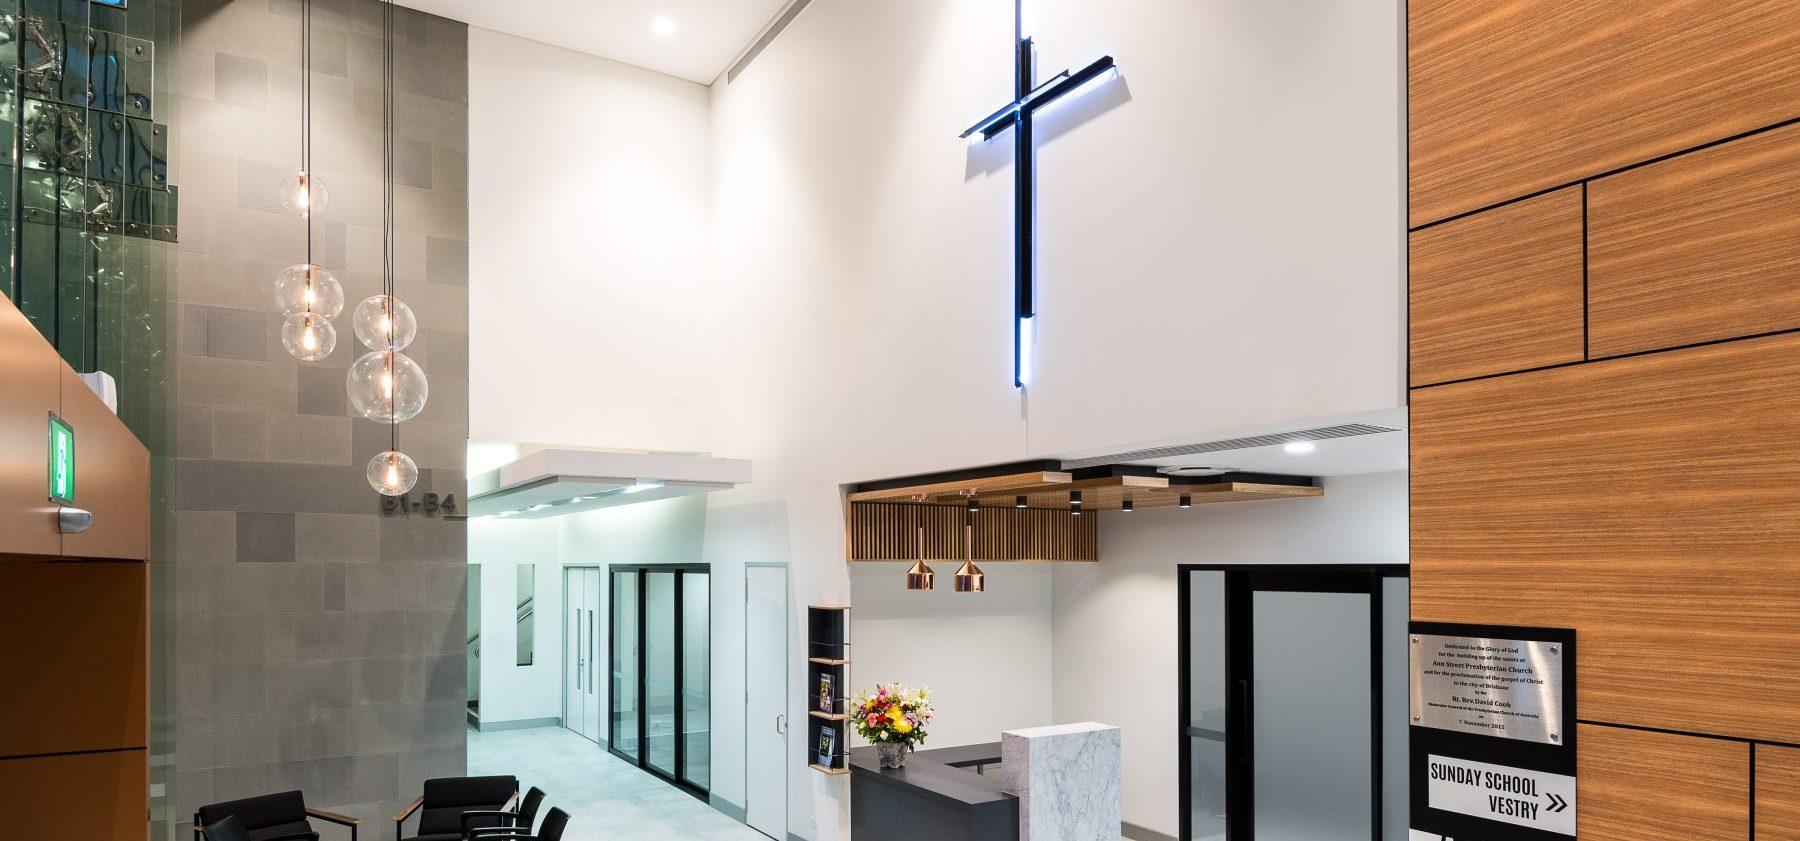 Ann Street Presbyterian Church Internal Entry